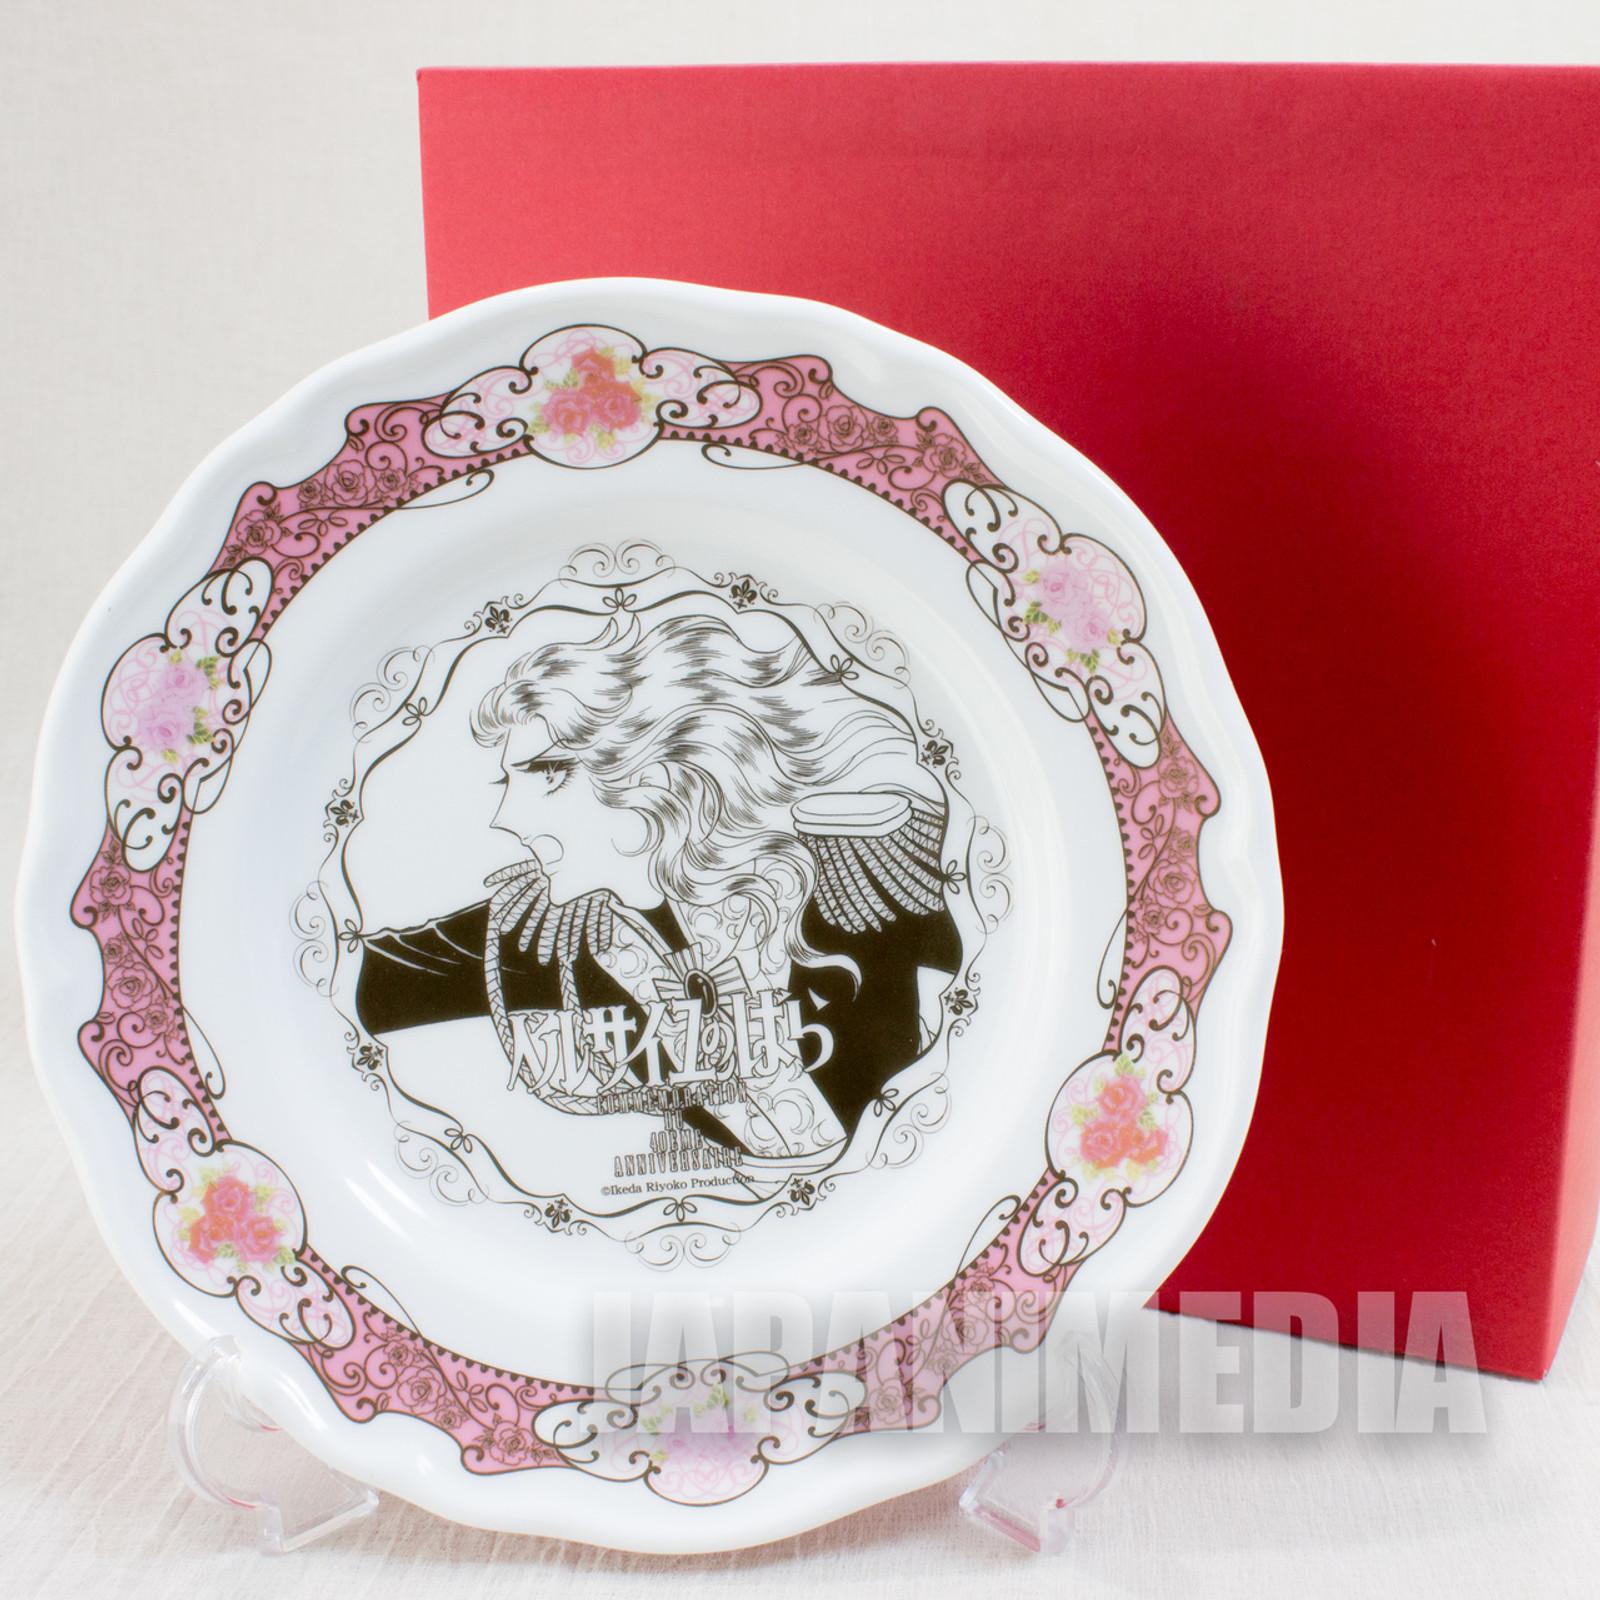 RARE! The Rose of Versailles Exhibition Dish Plate JAPAN ANIME MANGA